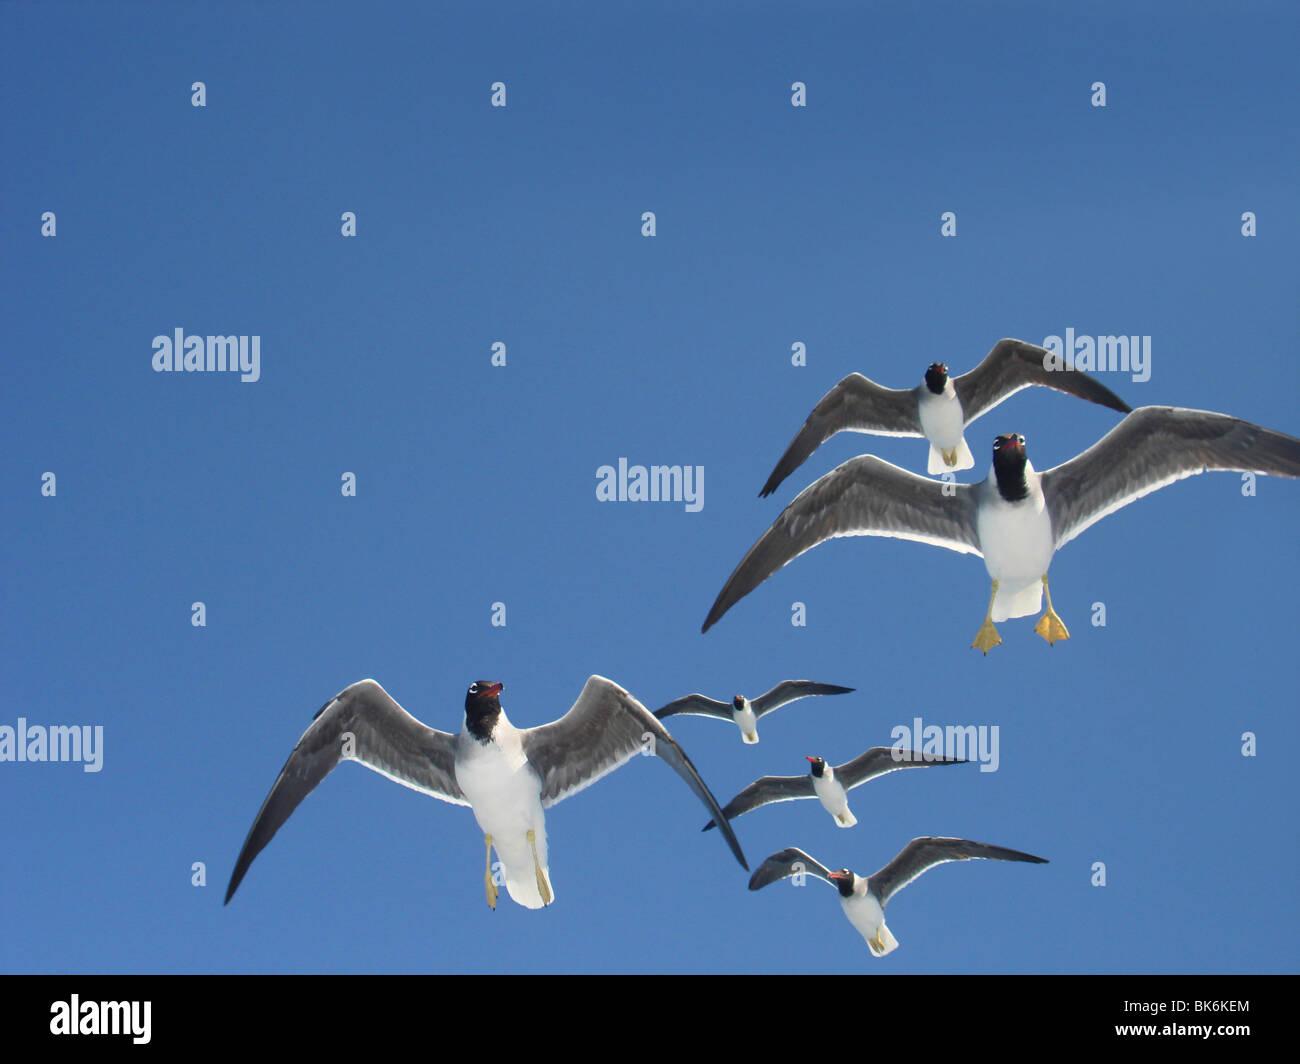 White-eyed gull in the sky, Ichthyaetus Leucophthalmus - Stock Image